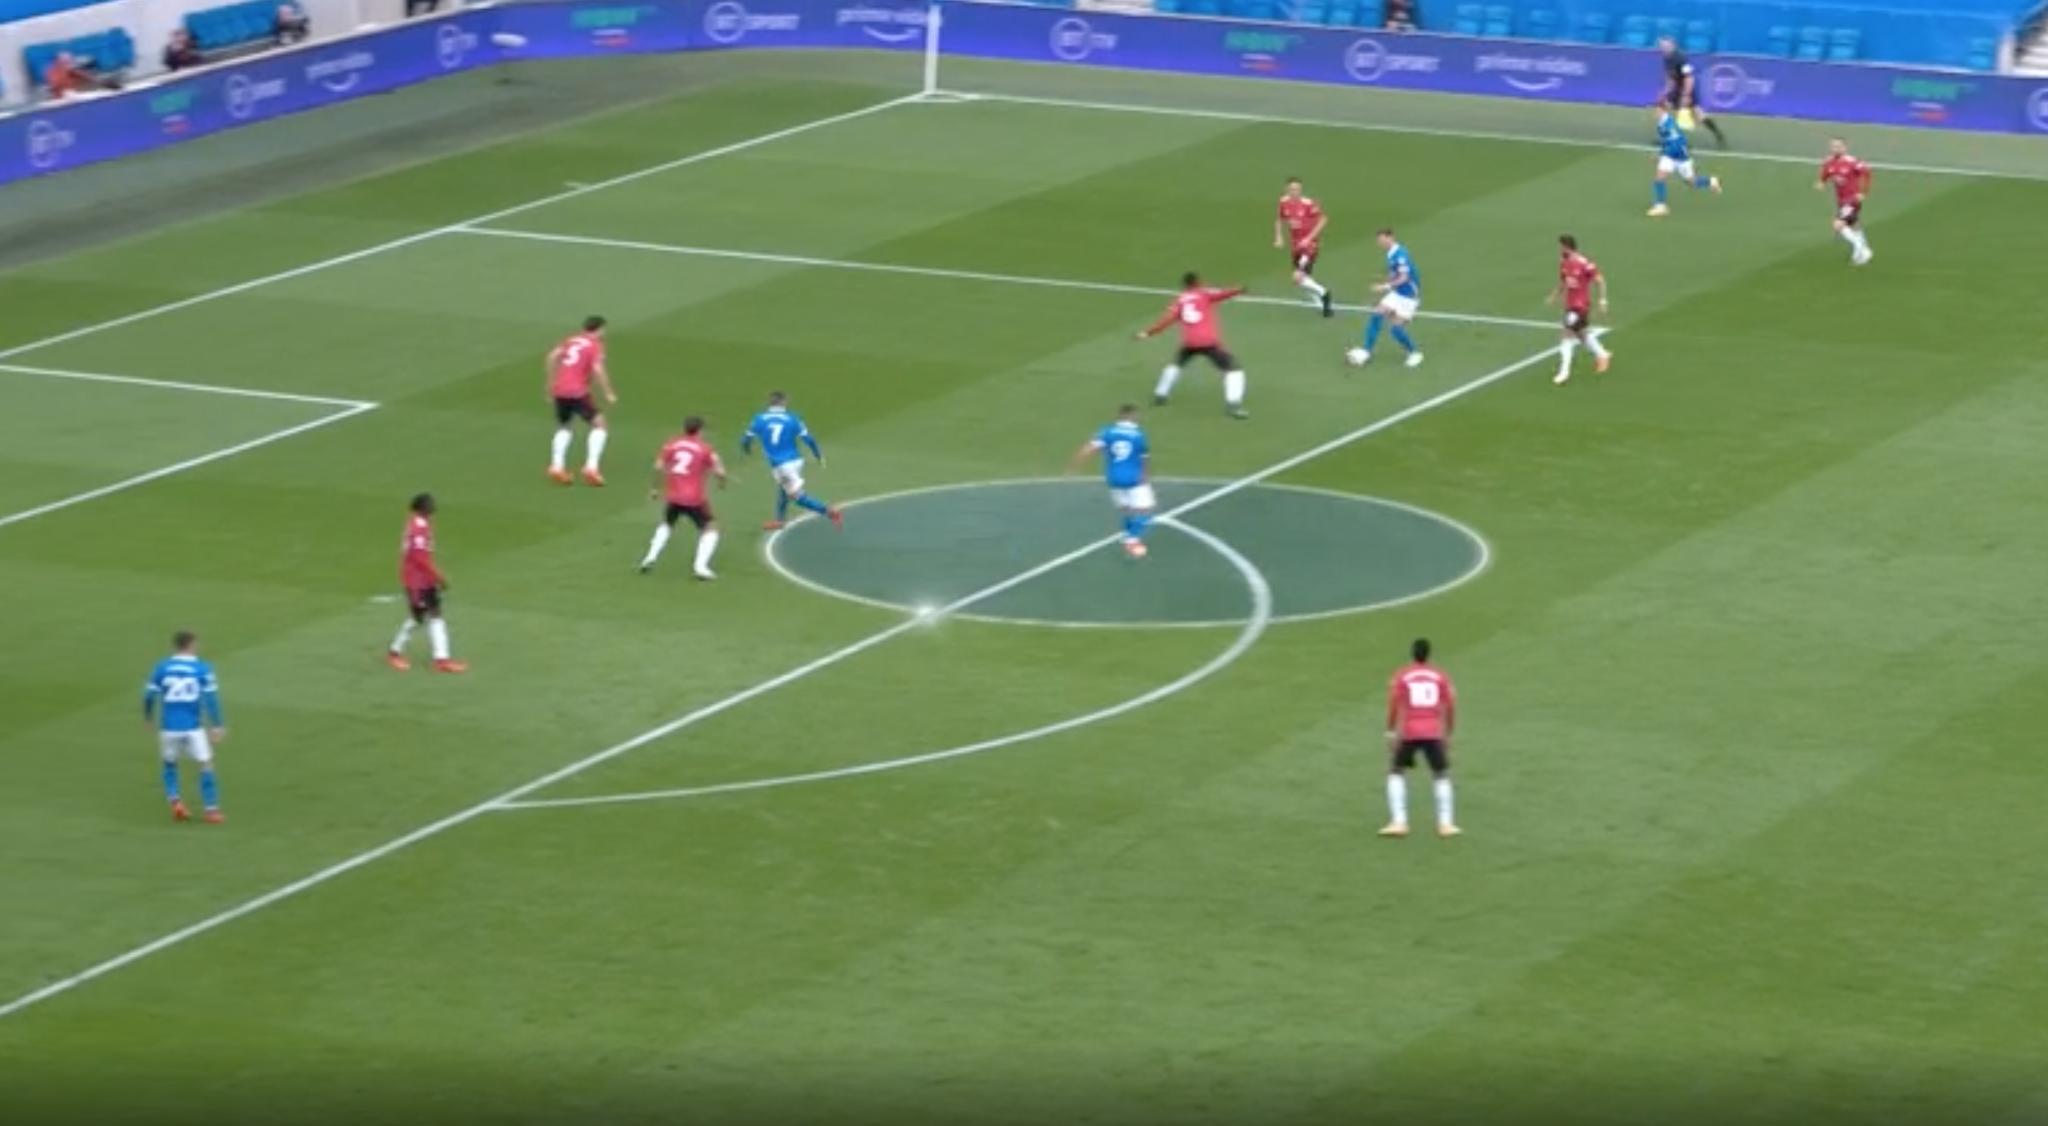 Manchester United defending